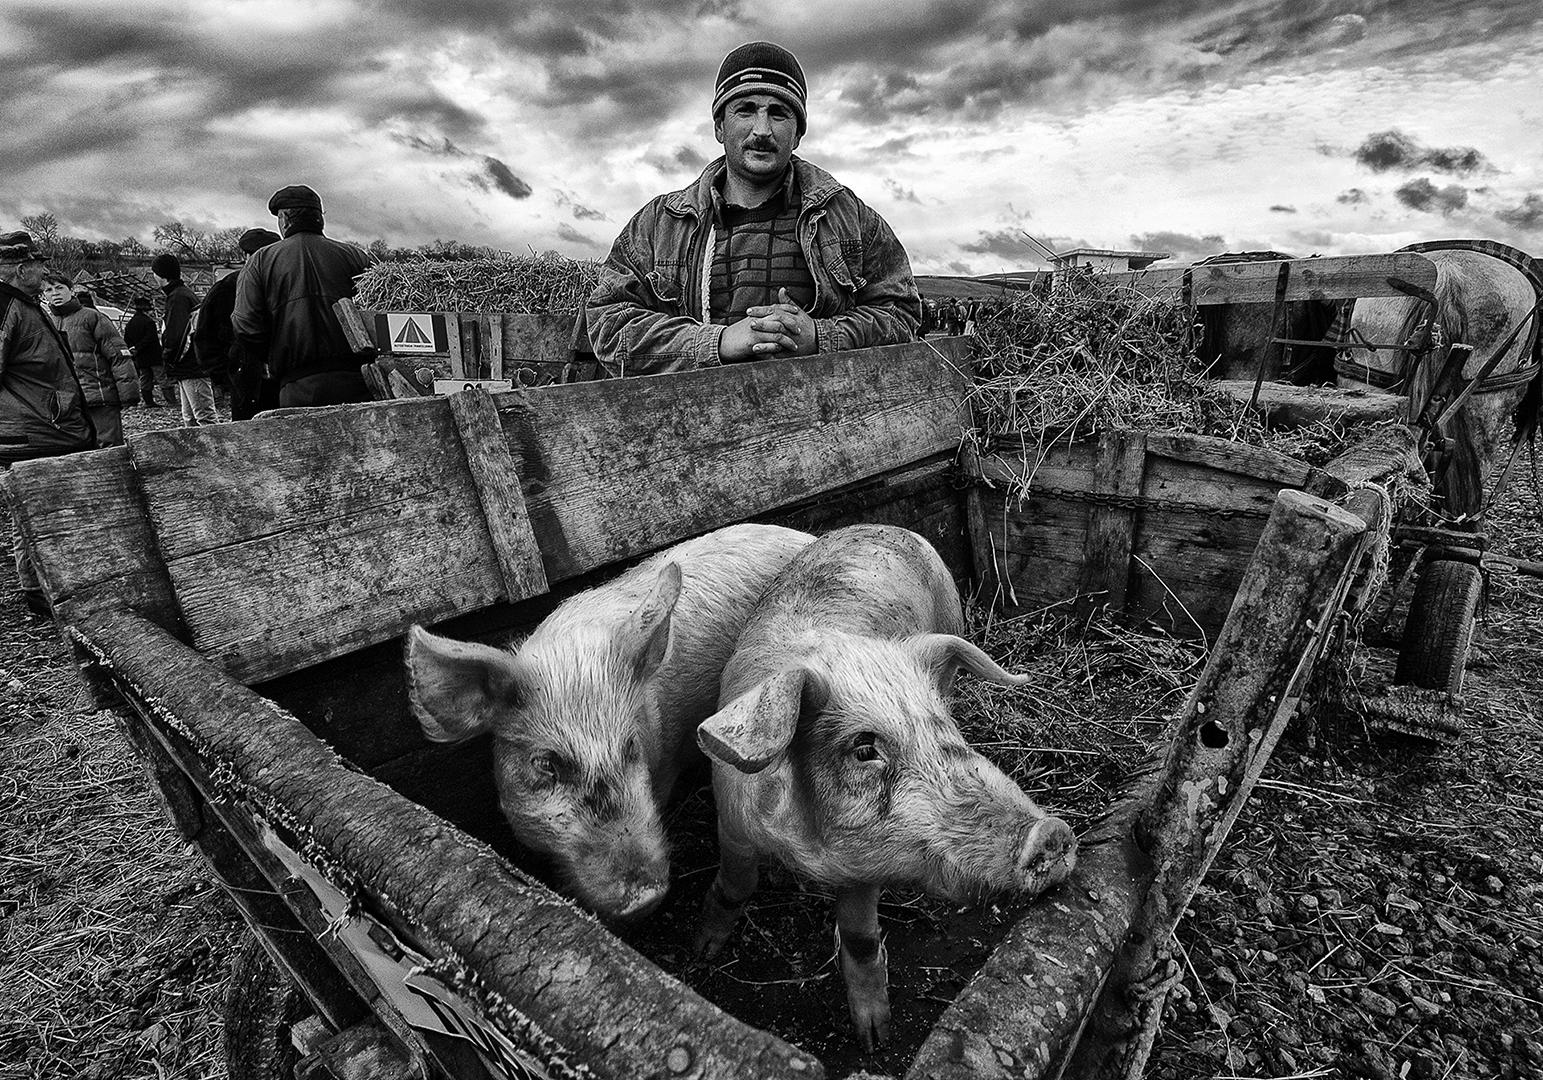 Pig trader, Søren Skov